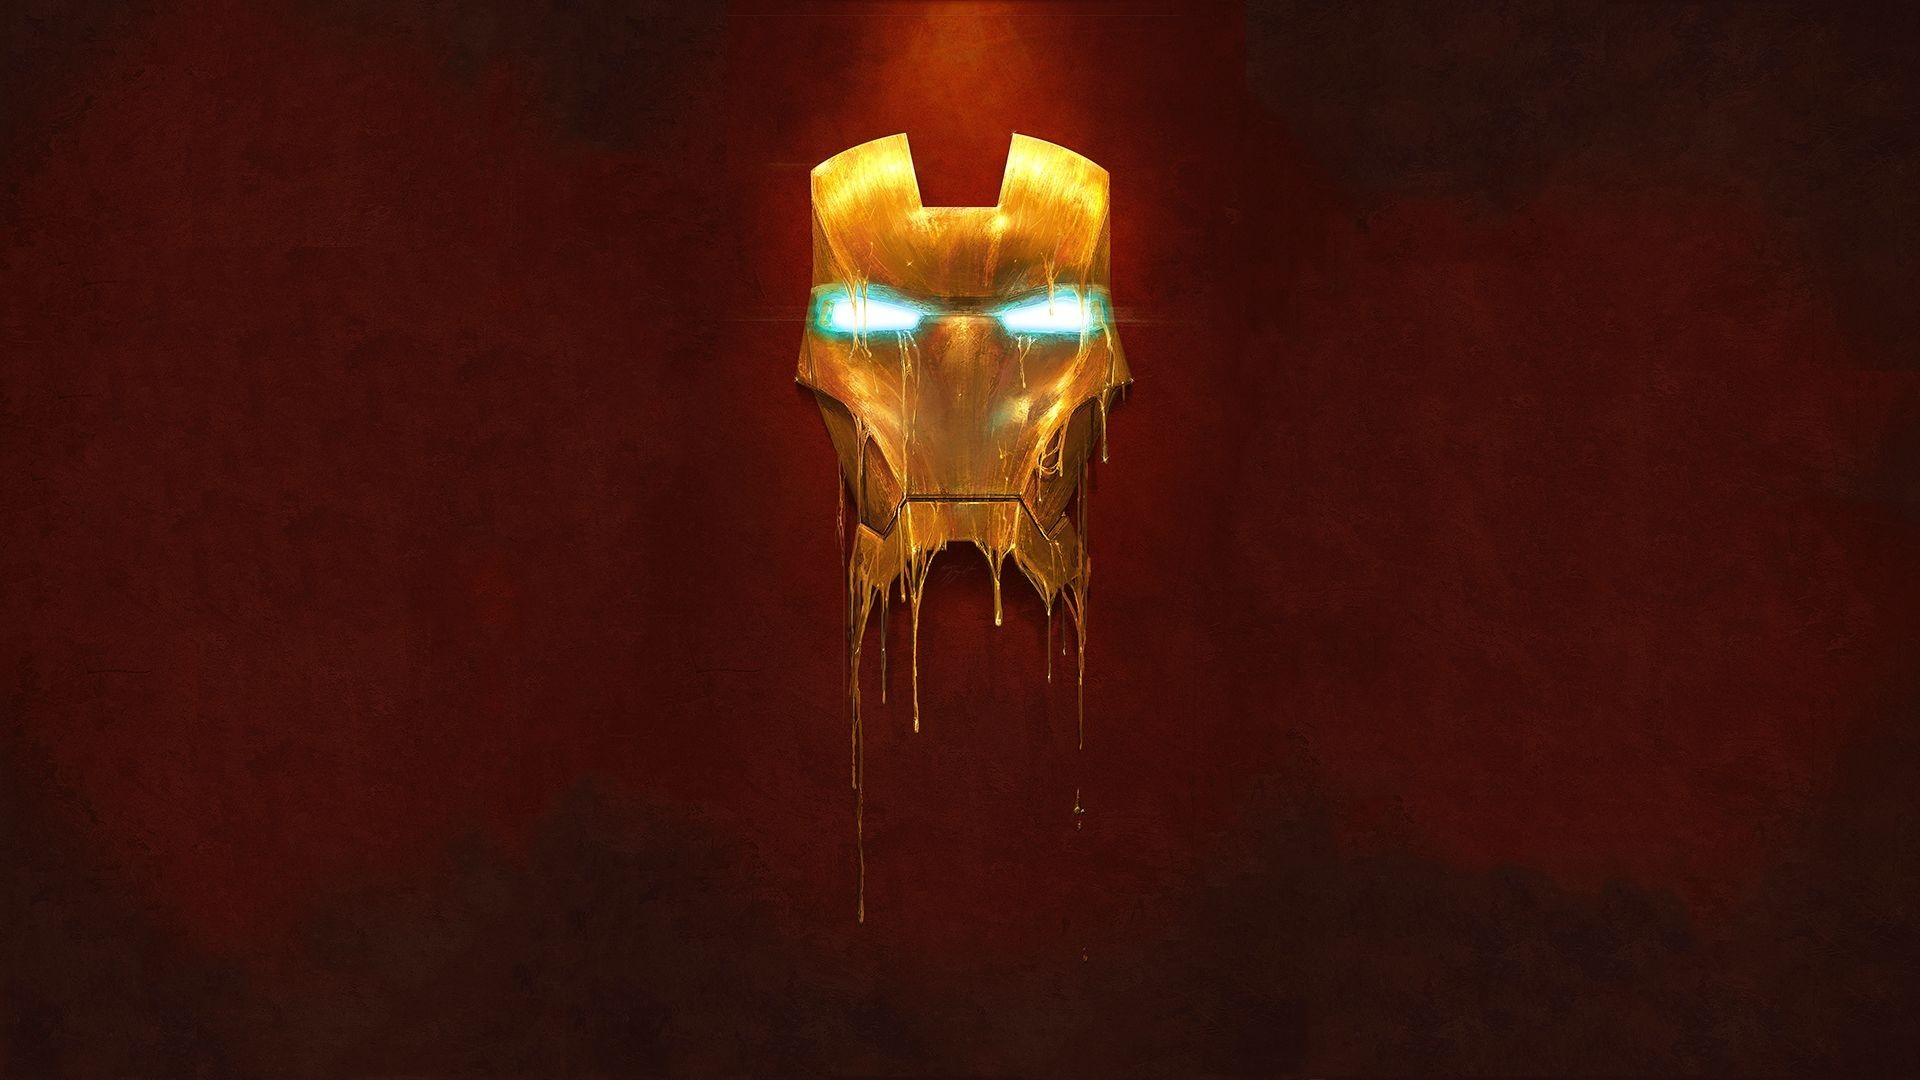 … Iron Man wallpapers: 250126 377609 81856 320922